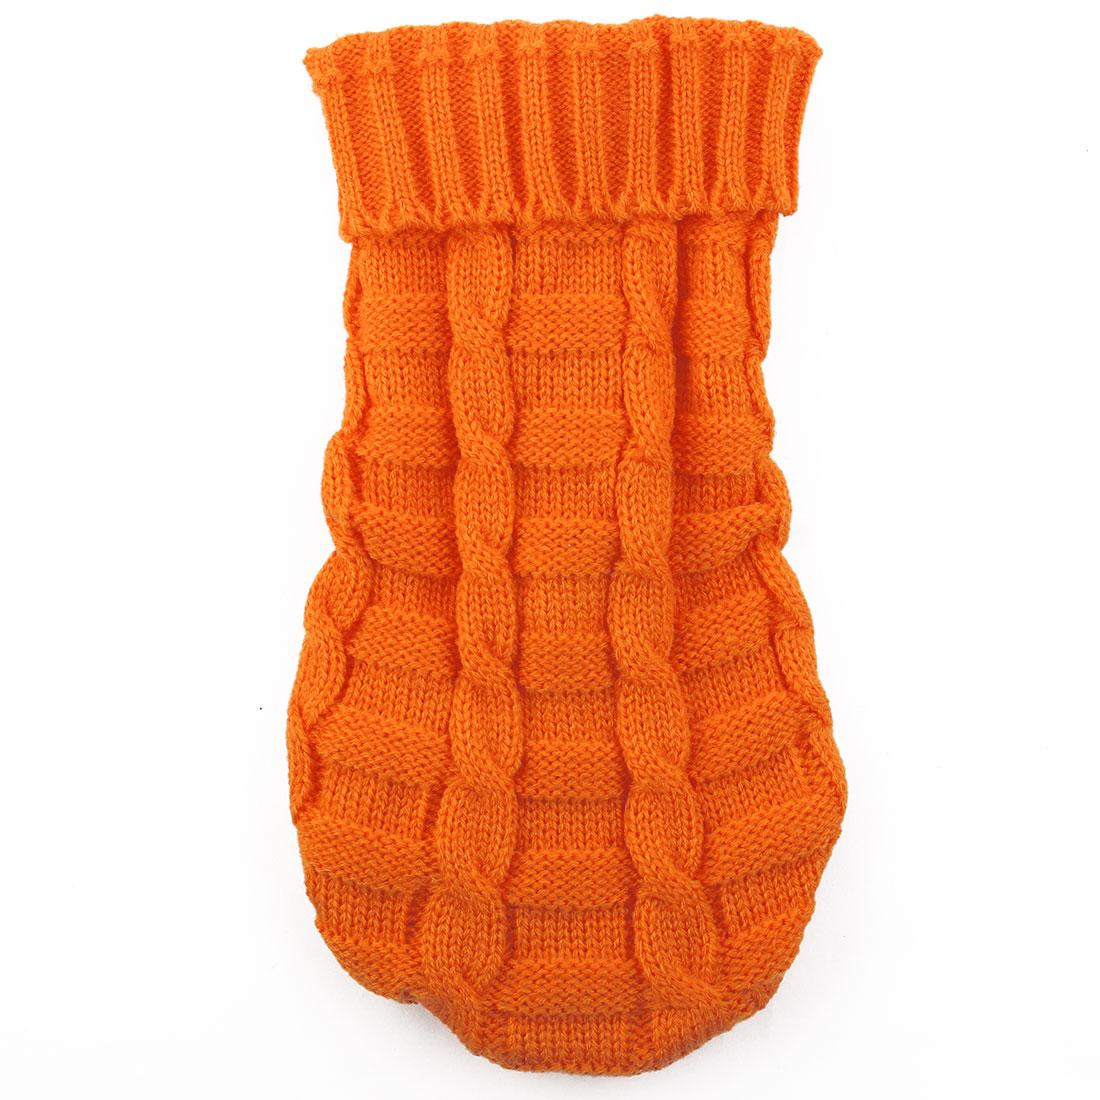 Pet Cat Woolen Grid Pattern Knitted Winter Warm Sweater Coat Clothes Apparel Costume Orange L